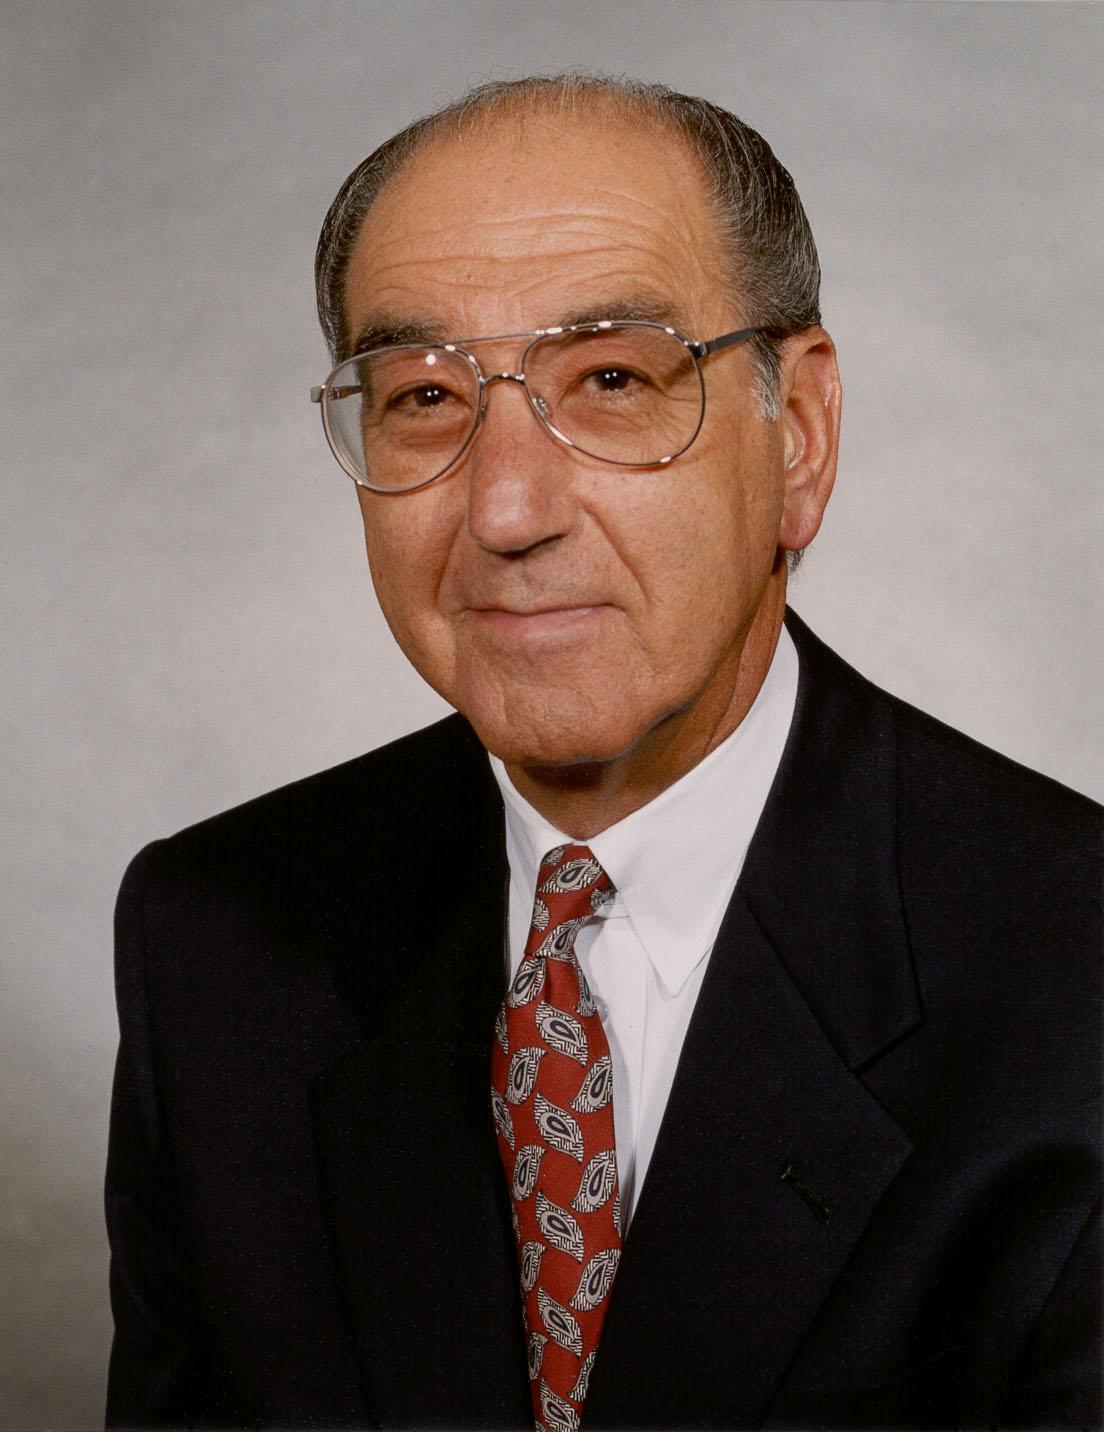 Dr. Seth Bonder